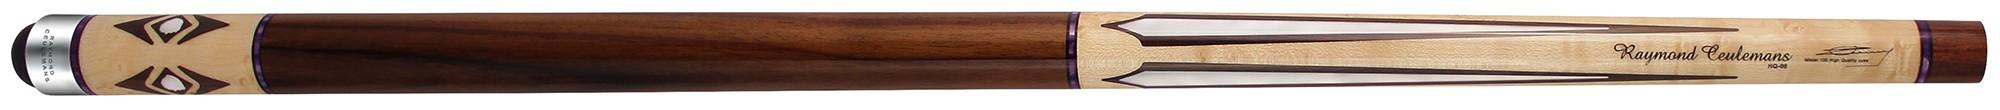 Raymond Ceulemans ® keu, HQ-06 inclusief extra top